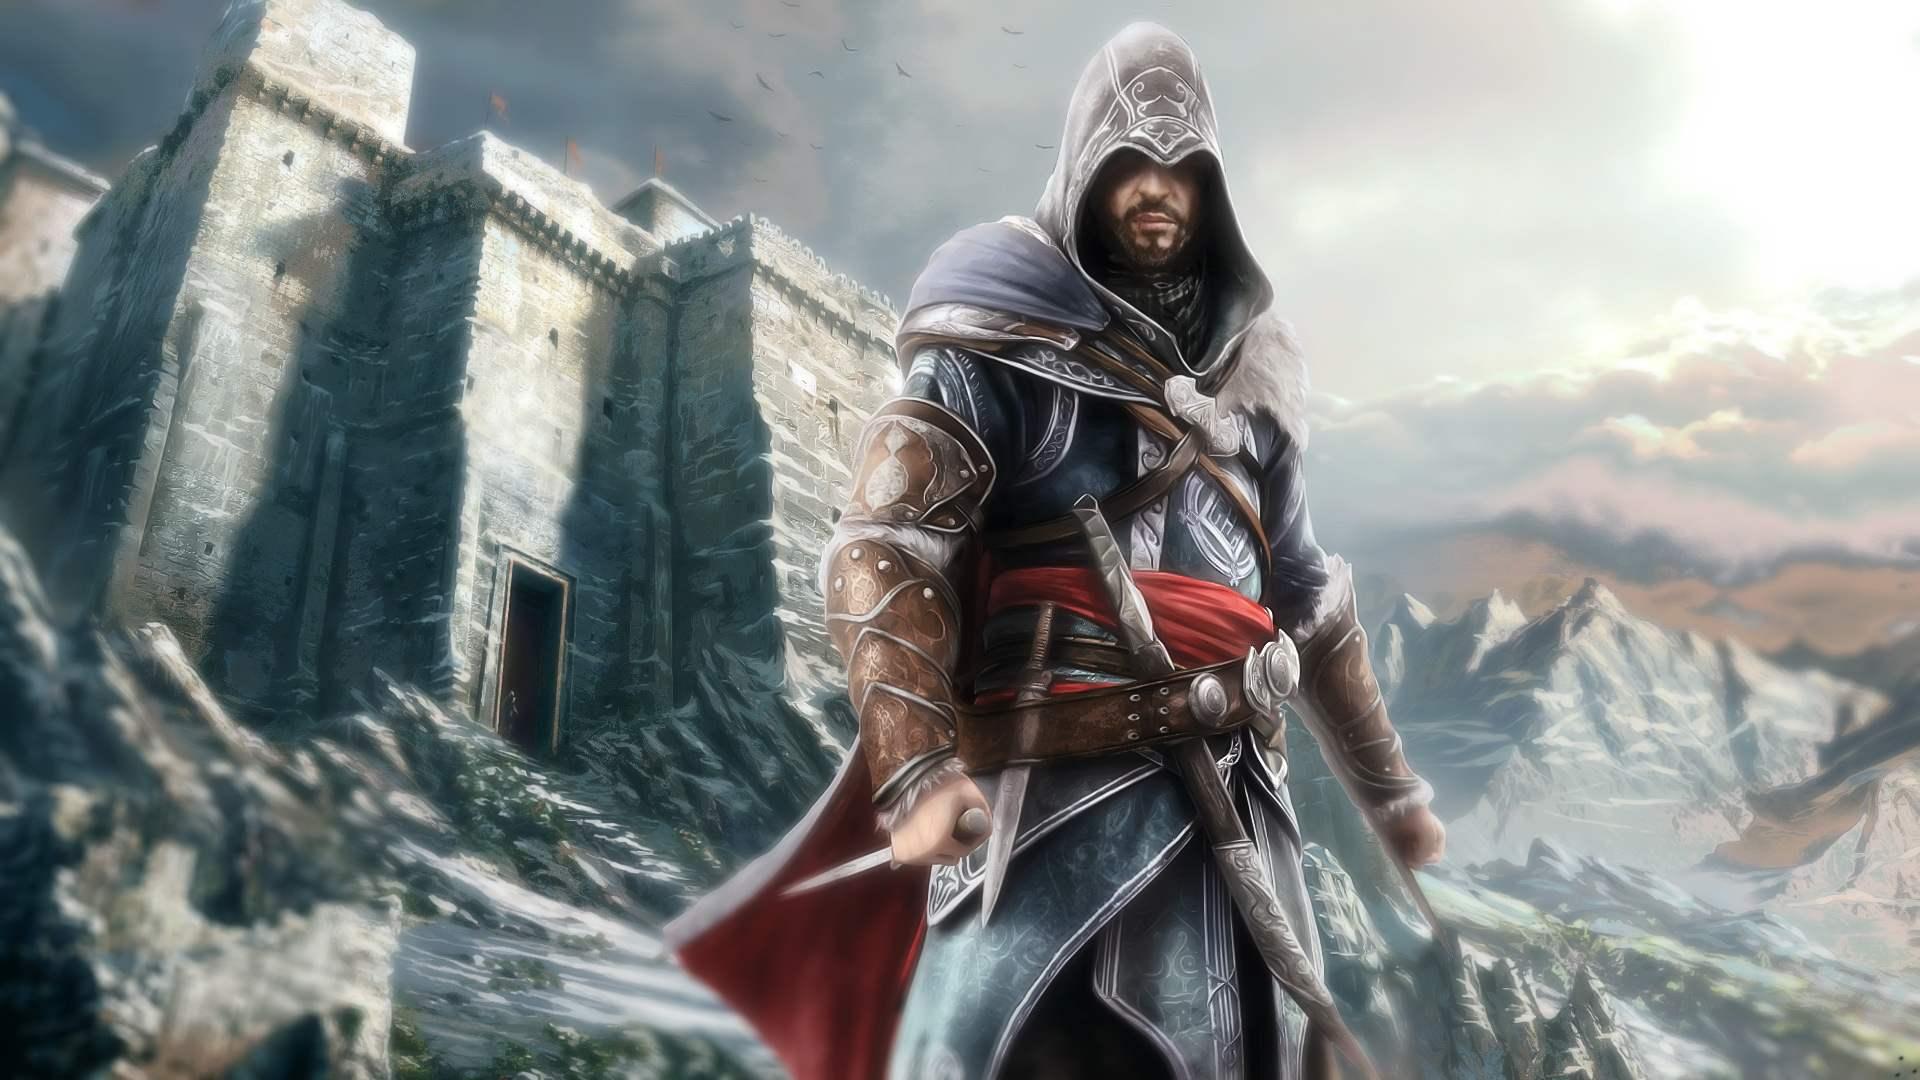 Kết quả hình ảnh cho Assassin's Creed: The Ezio Collection